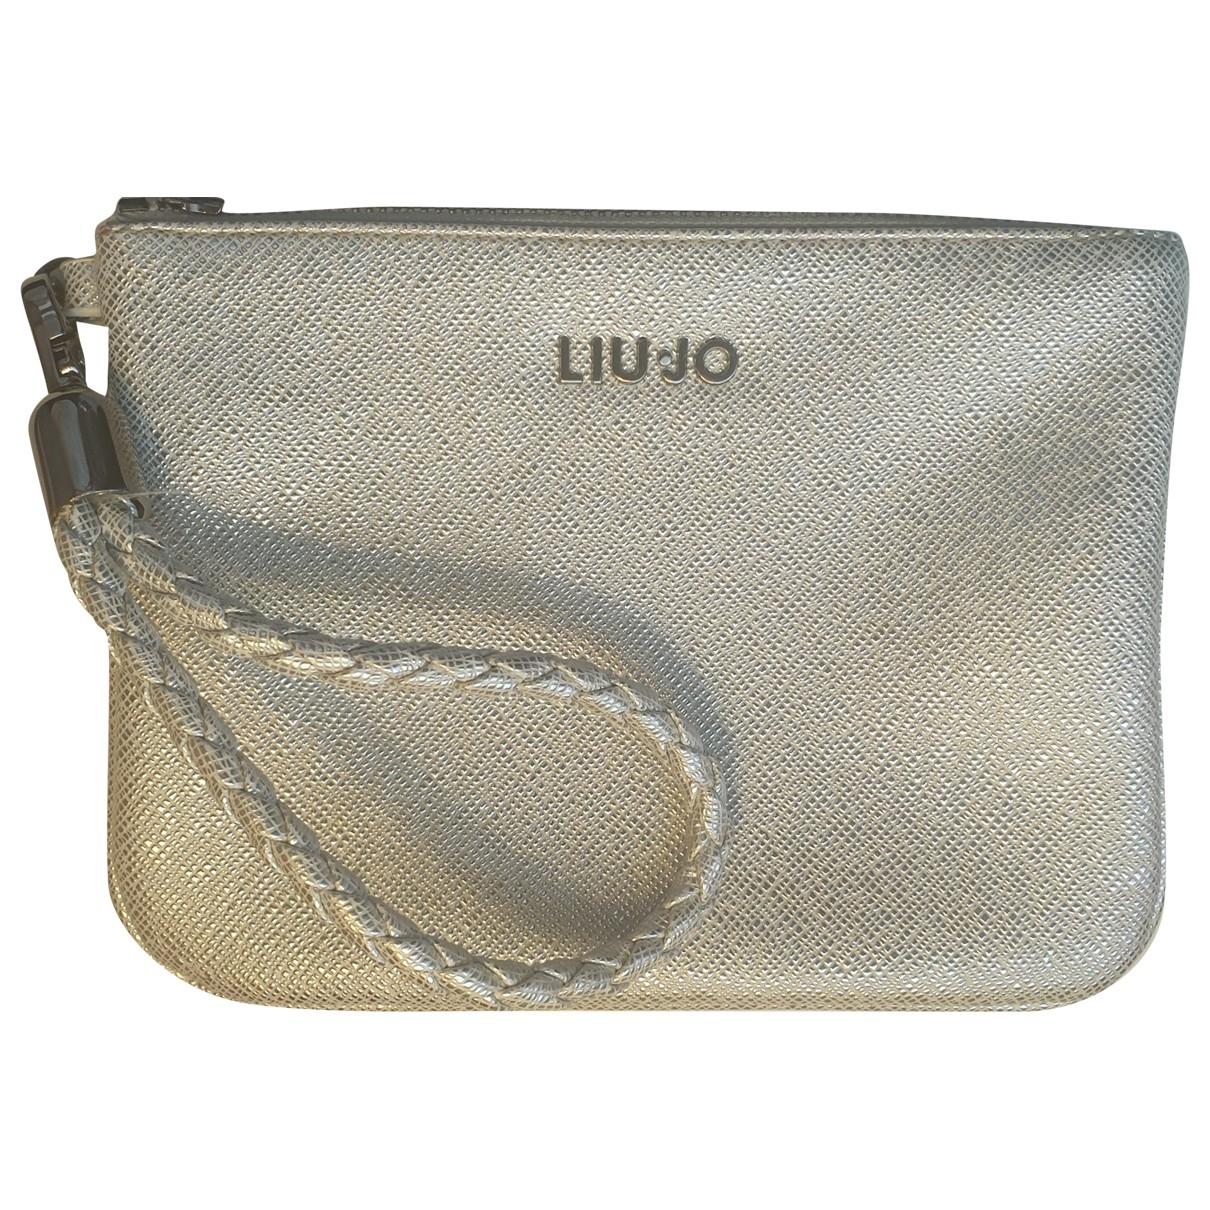 Liu.jo \N Clutch in  Silber Kunststoff